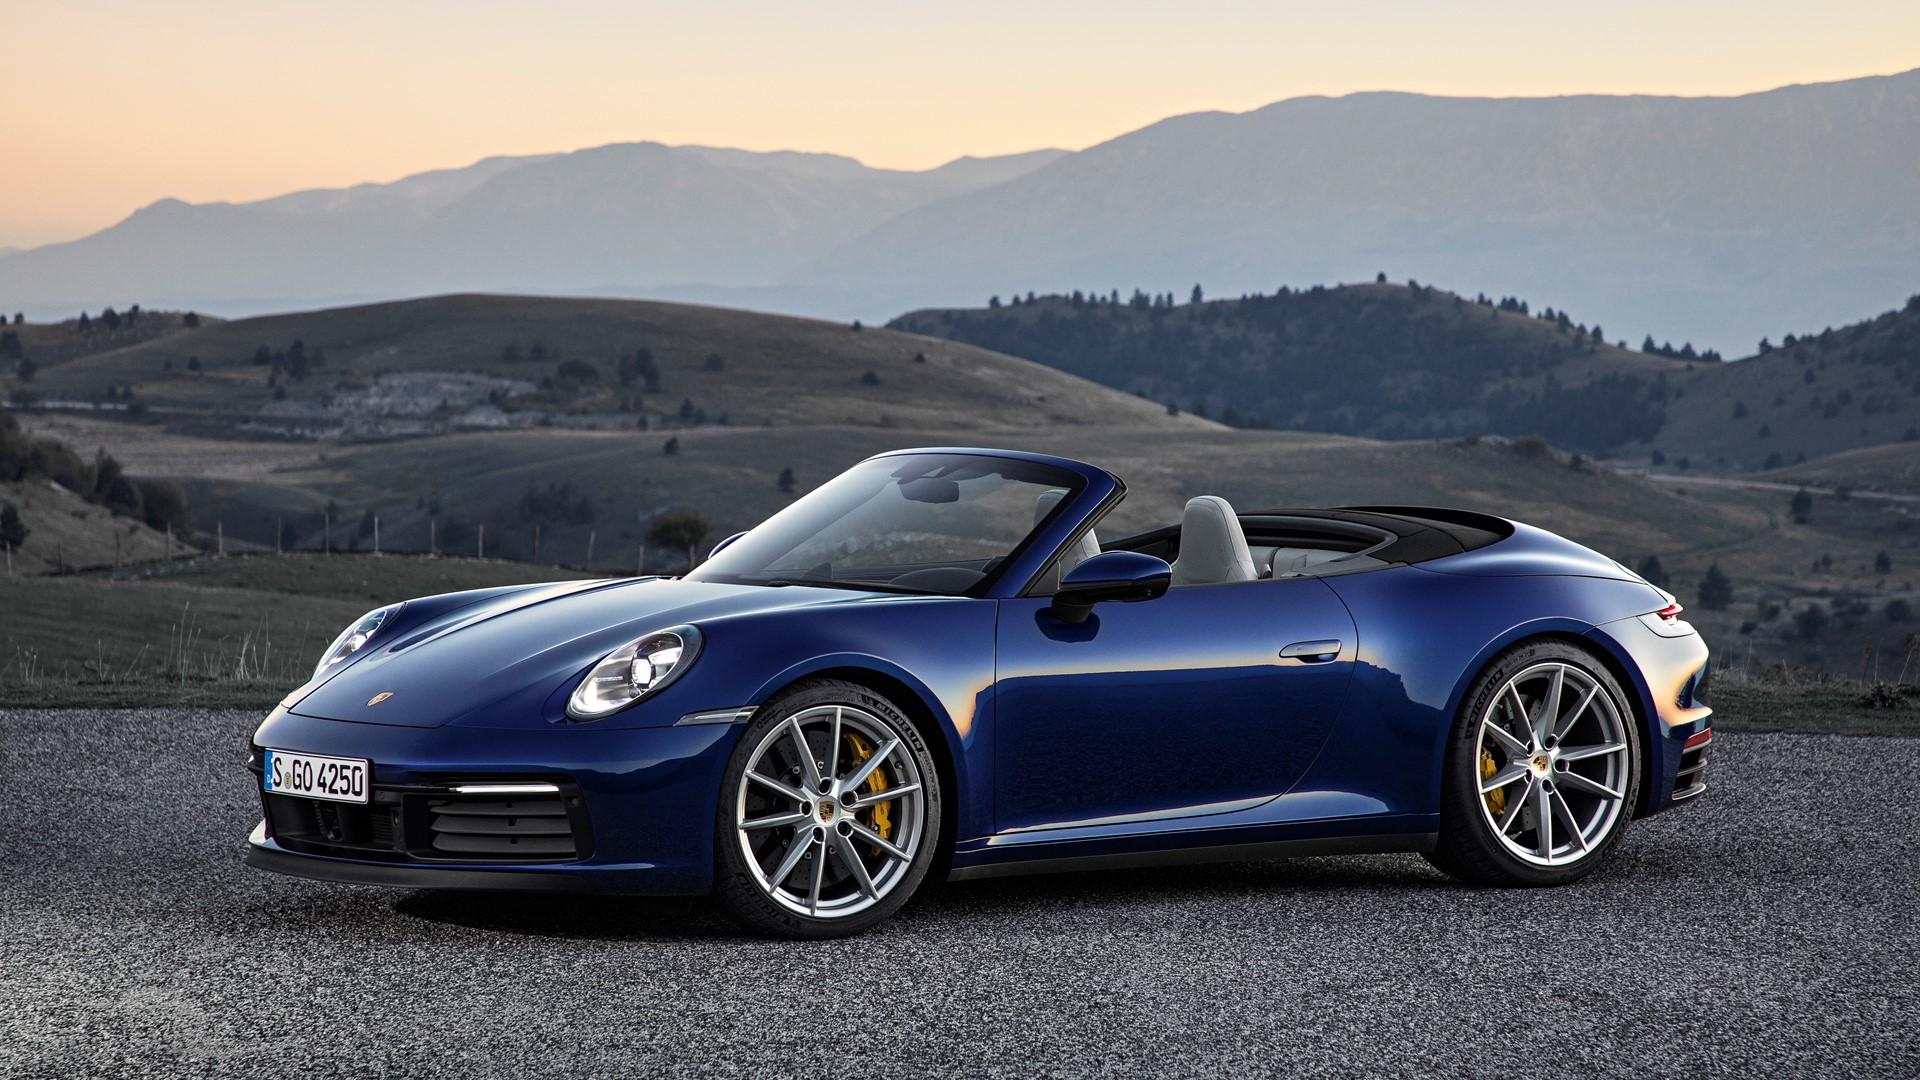 High Tech Soft Top For The New Porsche 911 Carrera Cabriolet